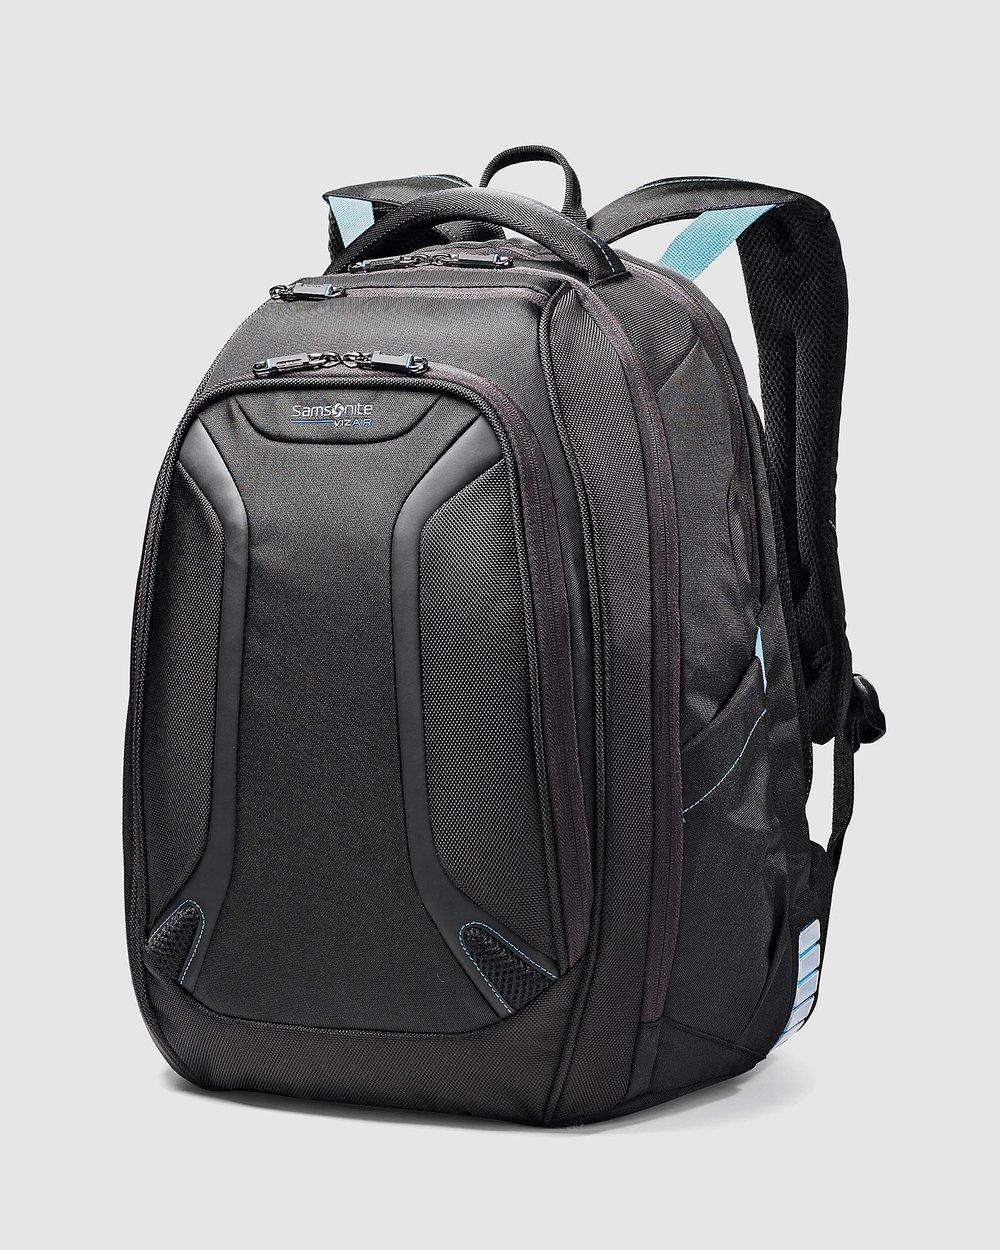 Viz Air Laptop Backpack by Samsonite Business Online  77e1f015f1efb